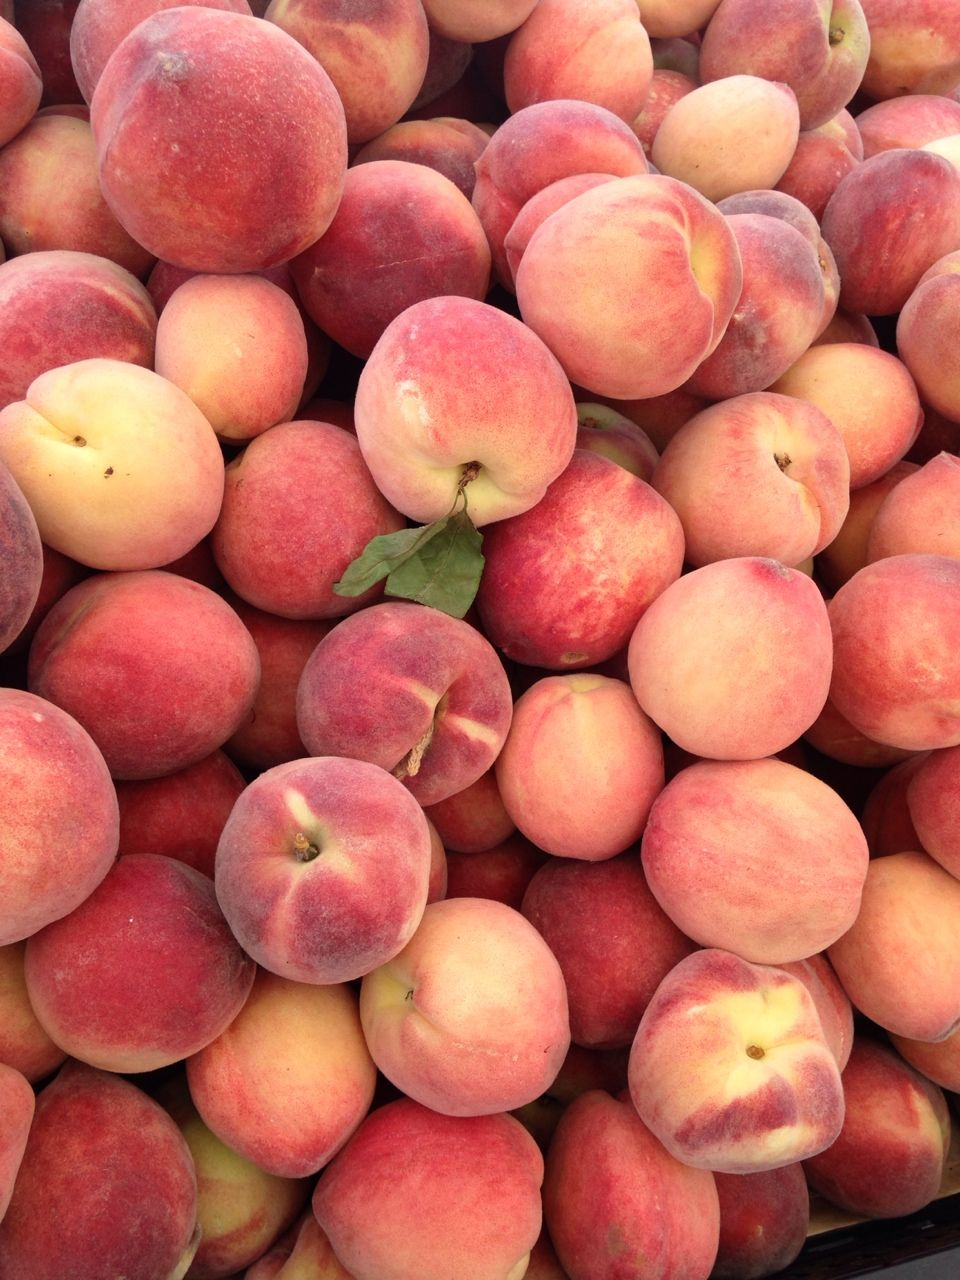 honey bub Fruit photography, Peach fruit